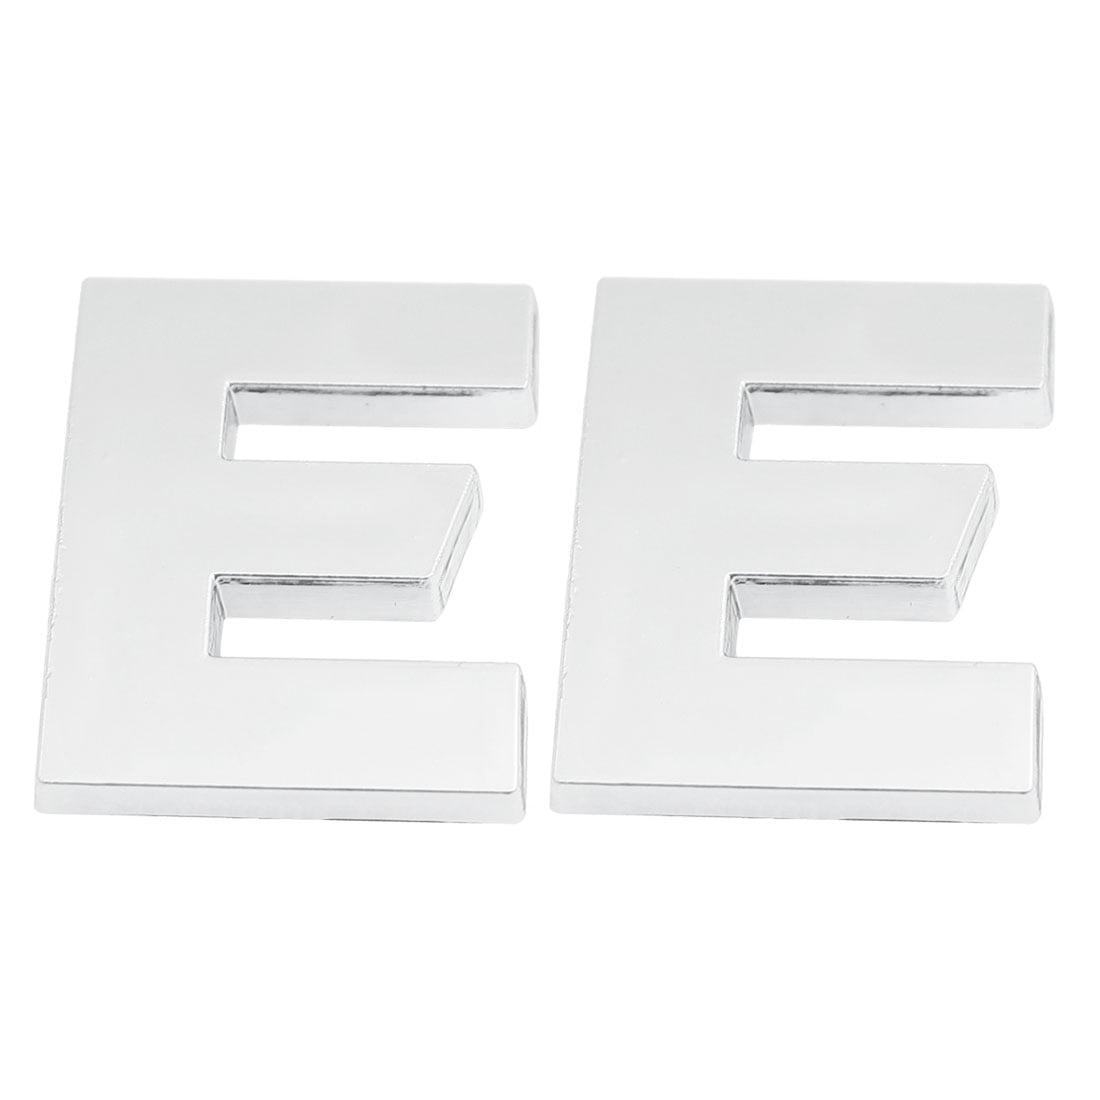 2 x Adhesive Plastic Letter E Cars 3D Emblem Badge Ornament Silver Tone